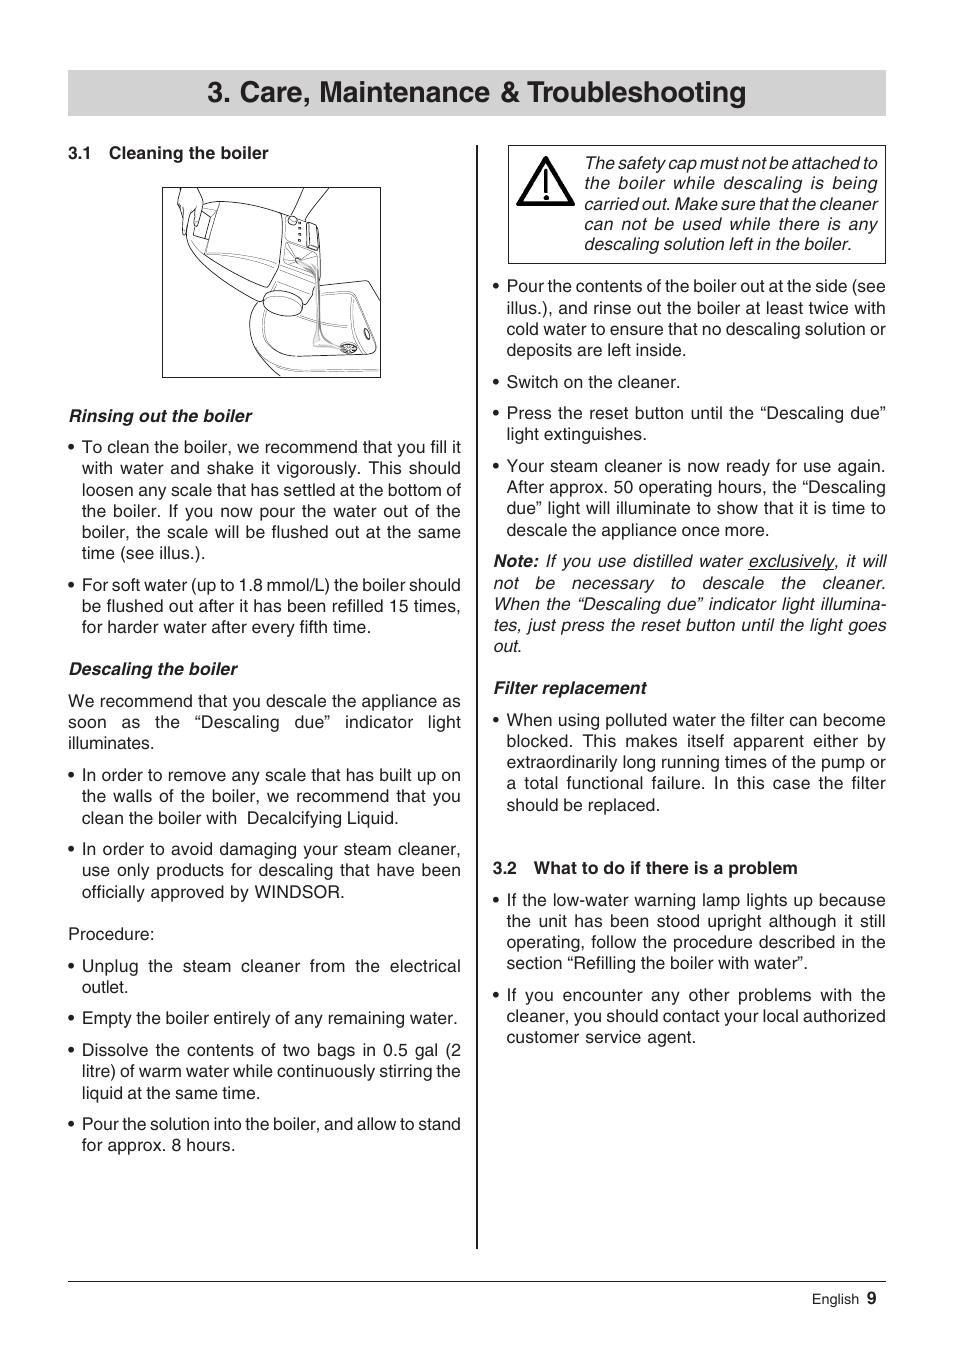 care maintenance troubleshooting windsor zephyr user manual rh manualsdir com zephyr user guide kawasaki zephyr 750 user manual